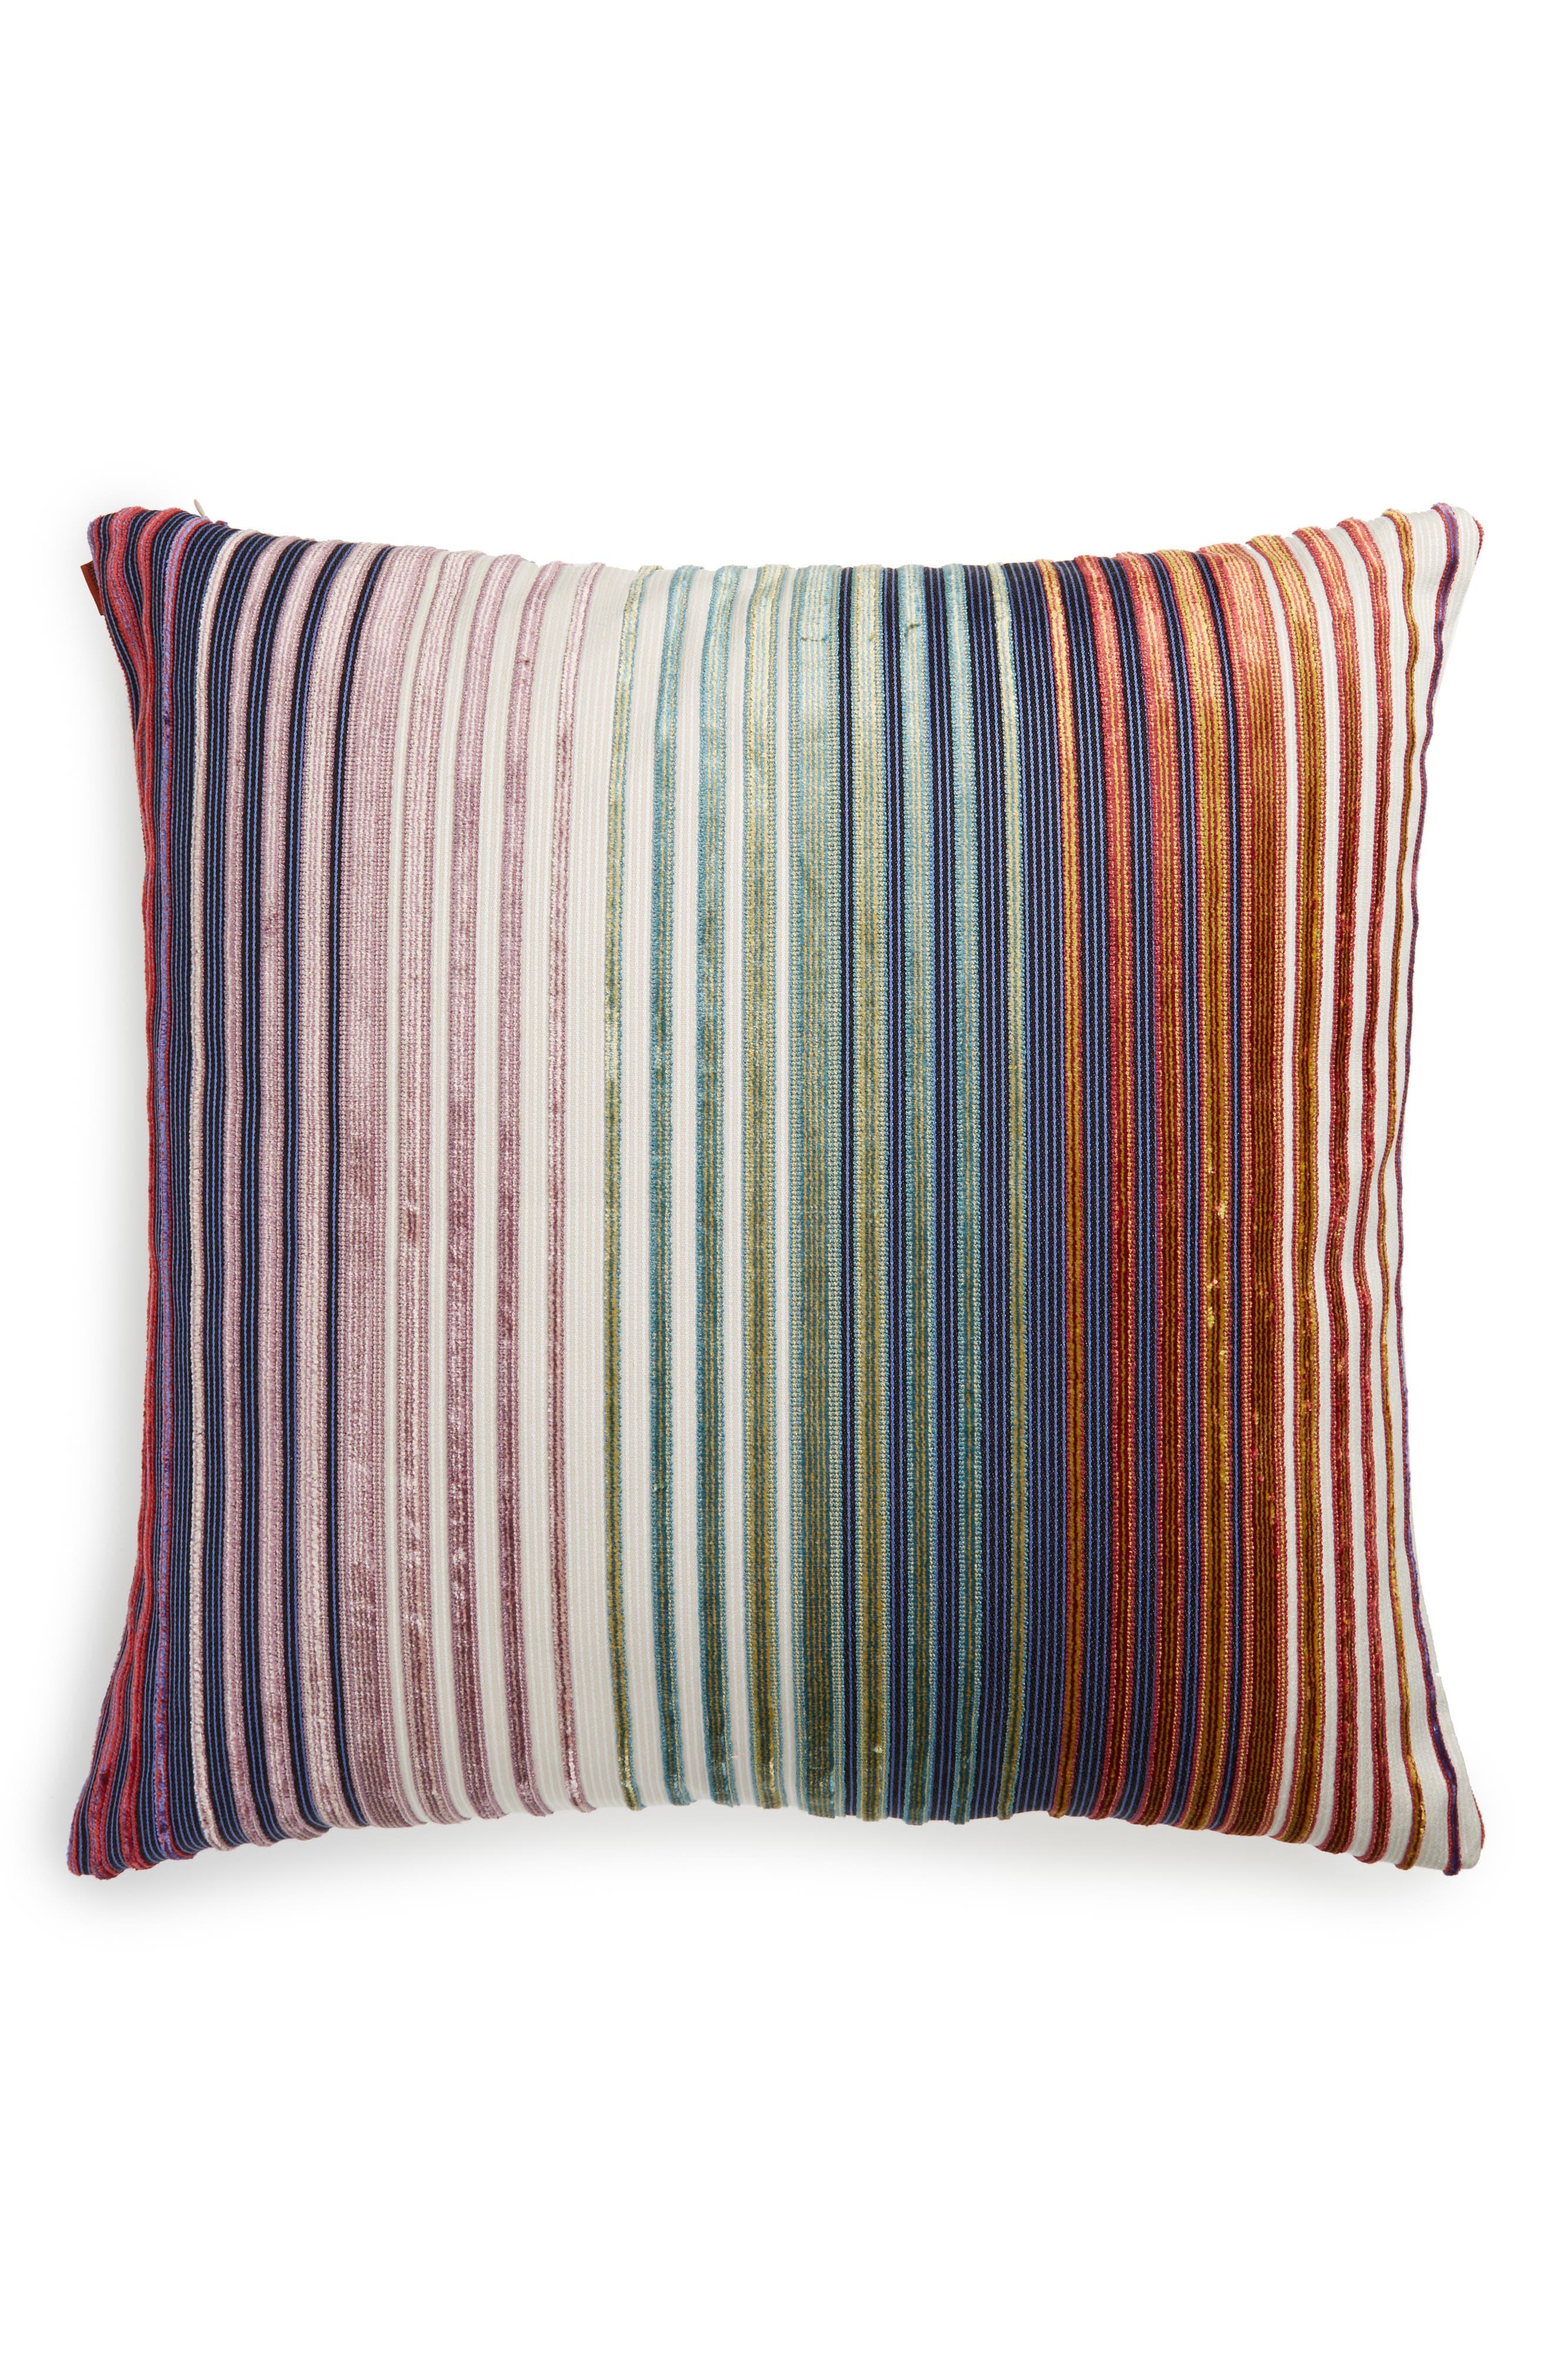 Tunisi Accent Pillow,                             Main thumbnail 1, color,                             Multi Color